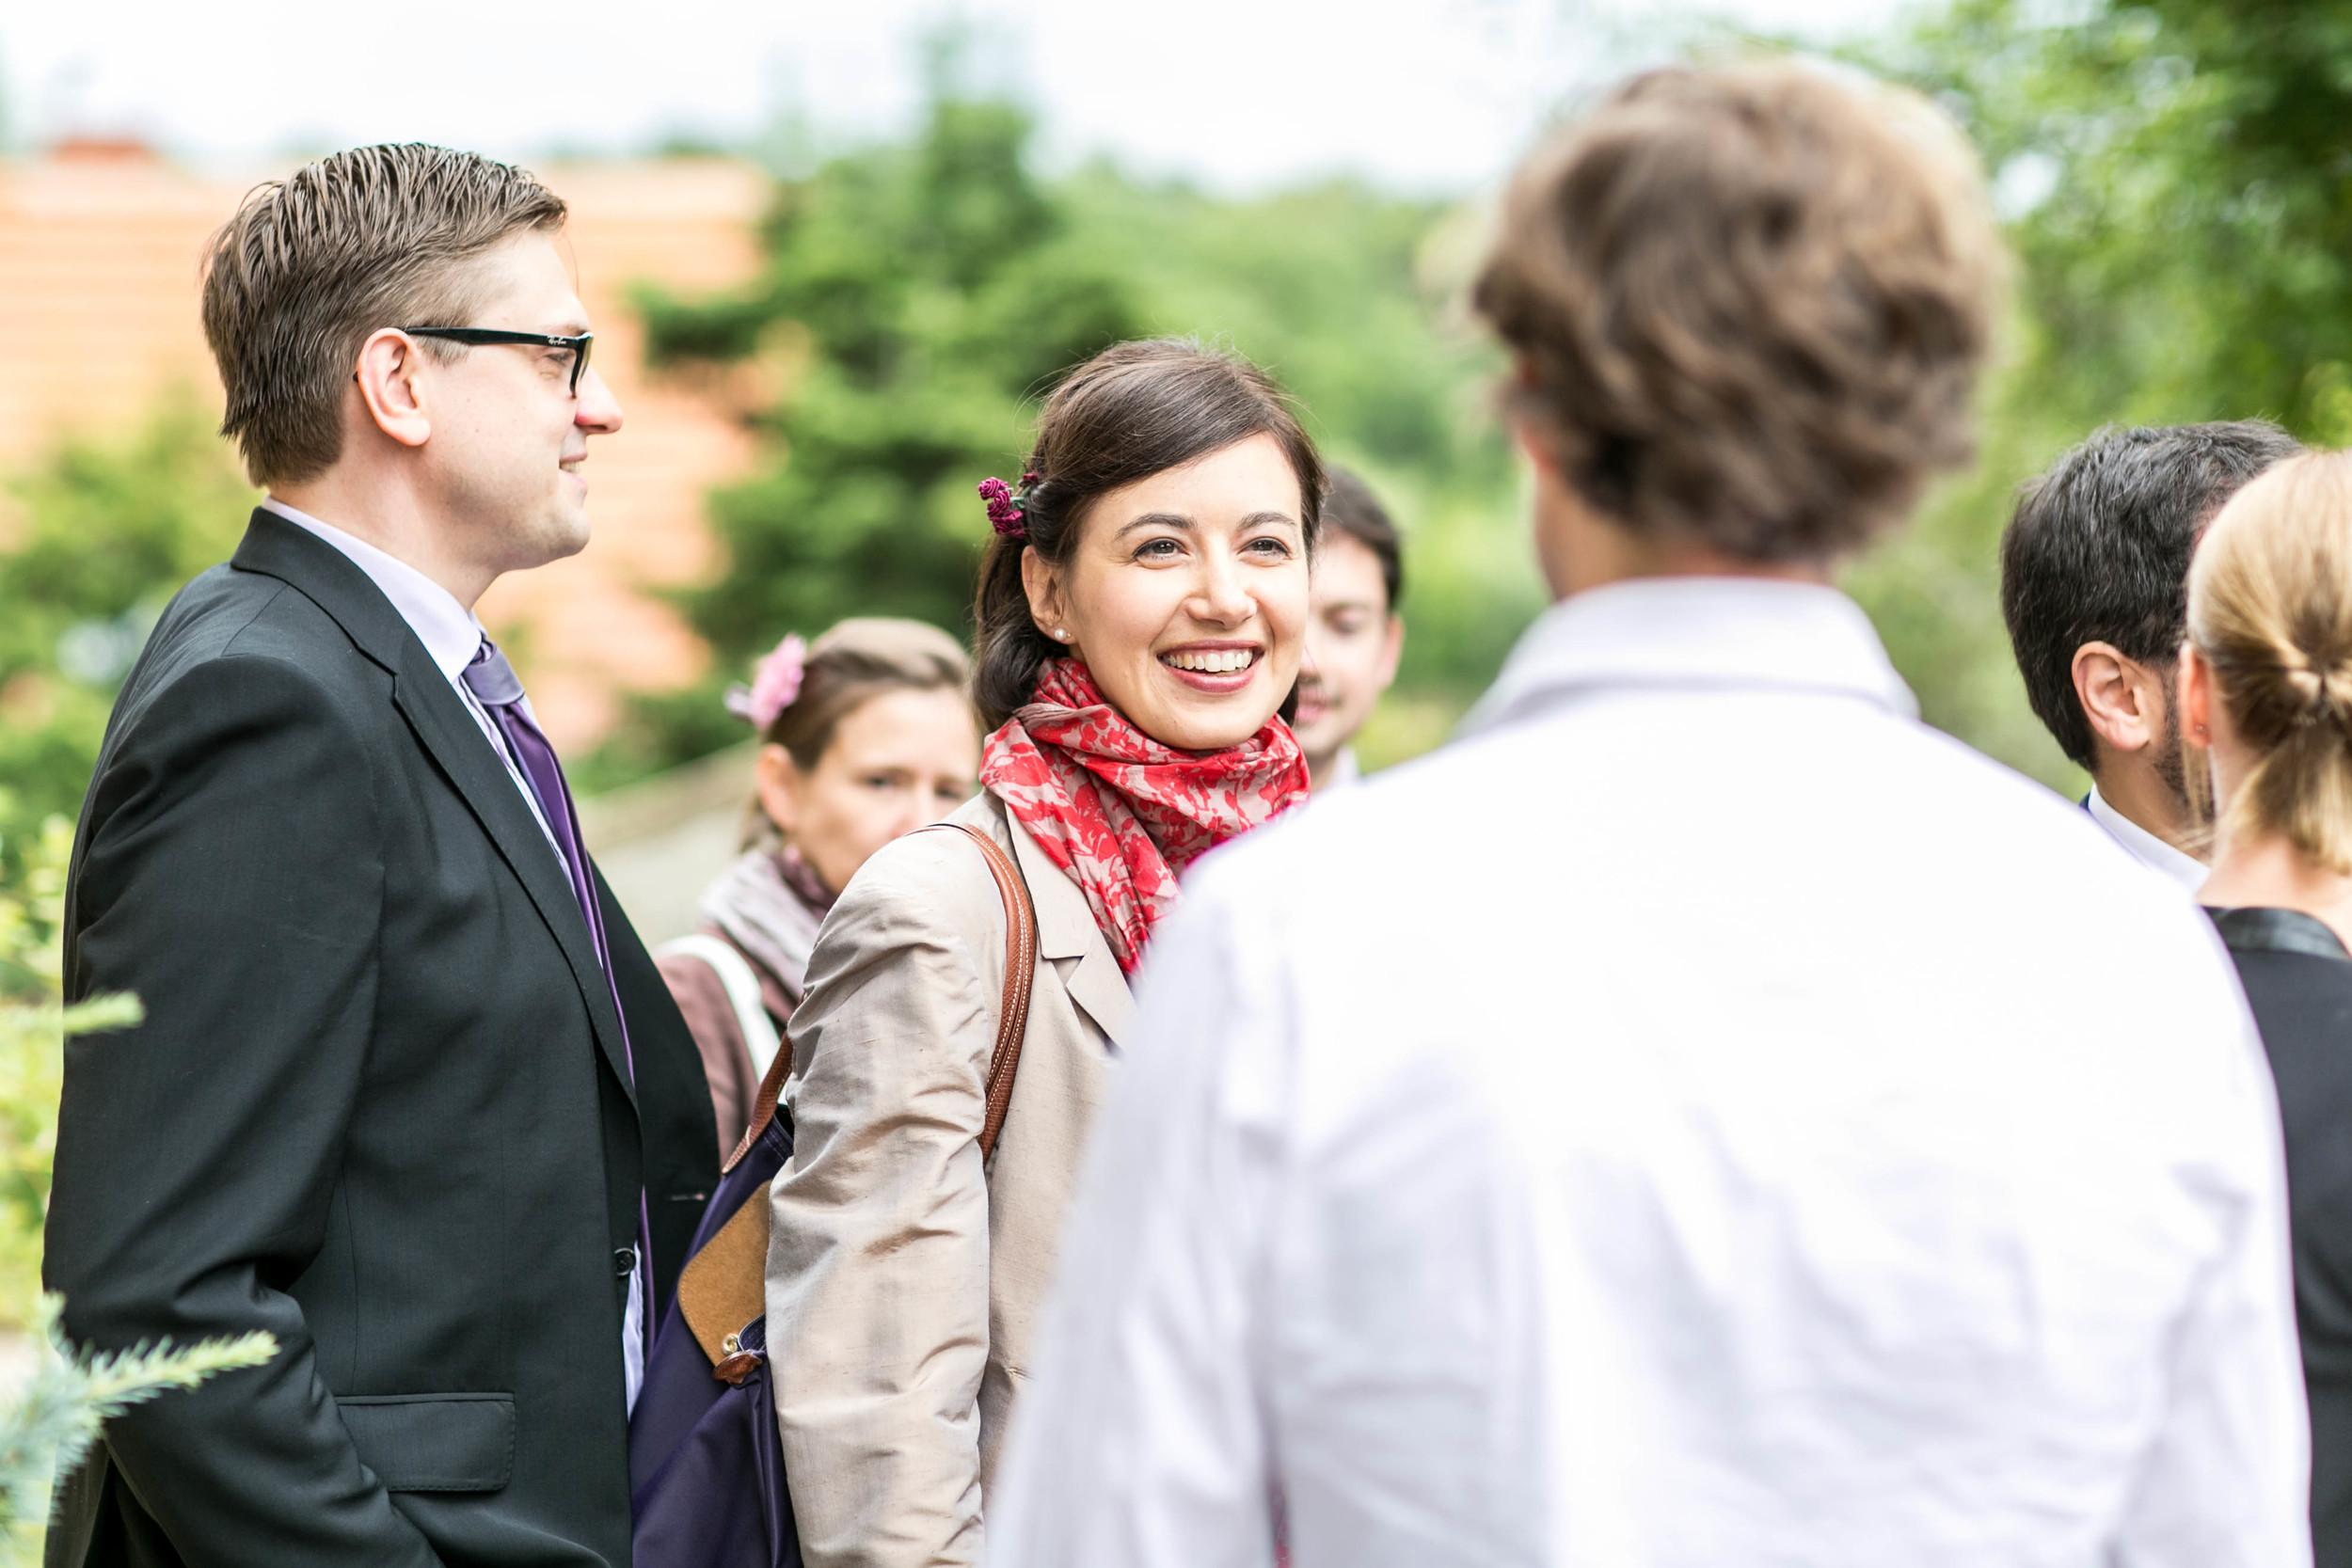 Hochzeitsfotografie Berlin_Fran Burrows Fotografie_2.jpg